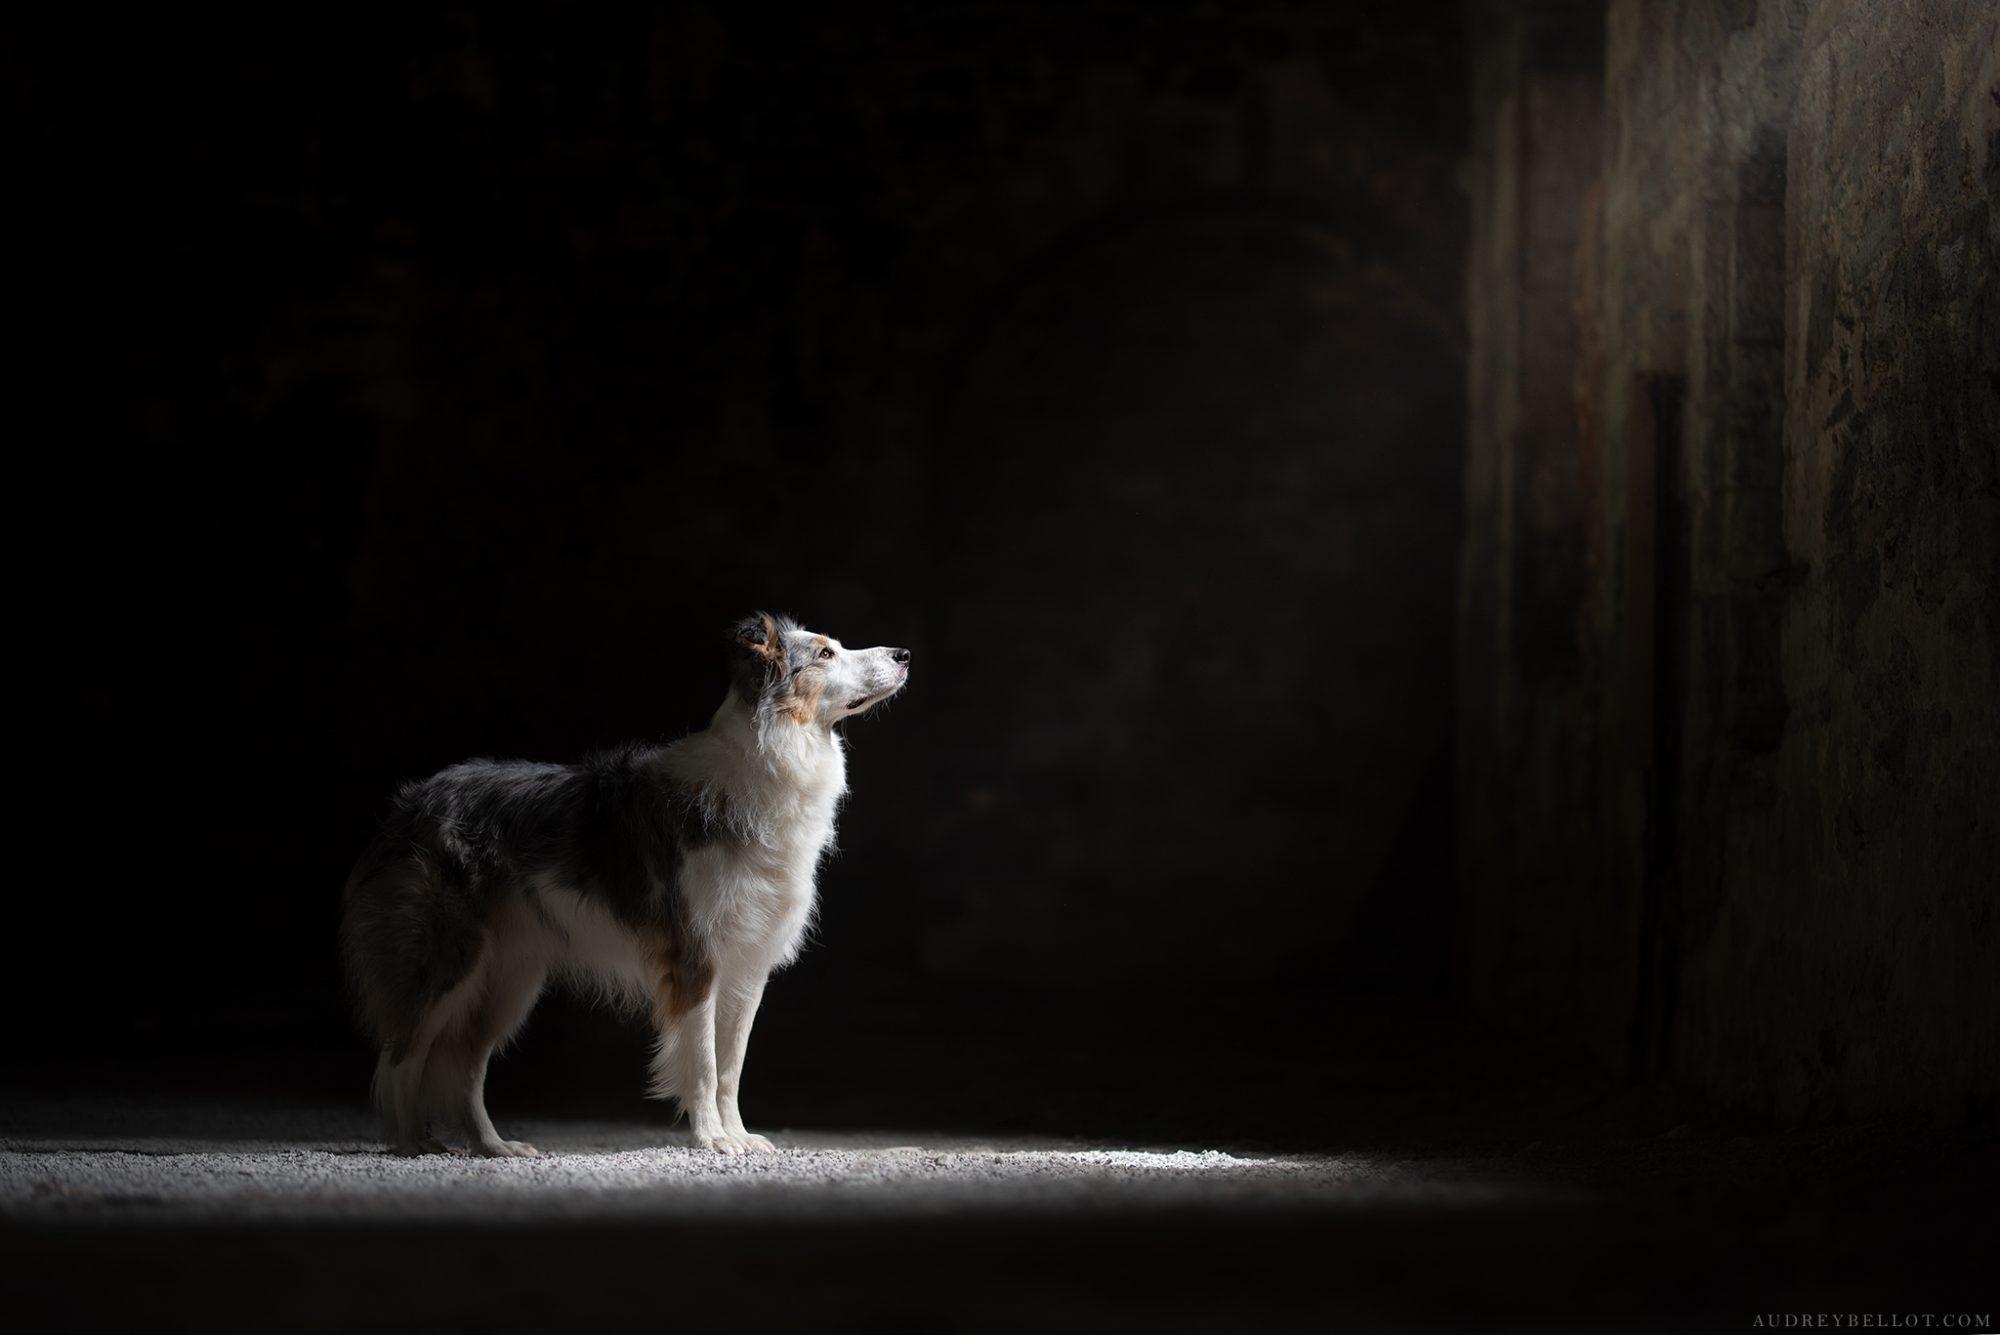 photographie canine photographe animalier chien border collie